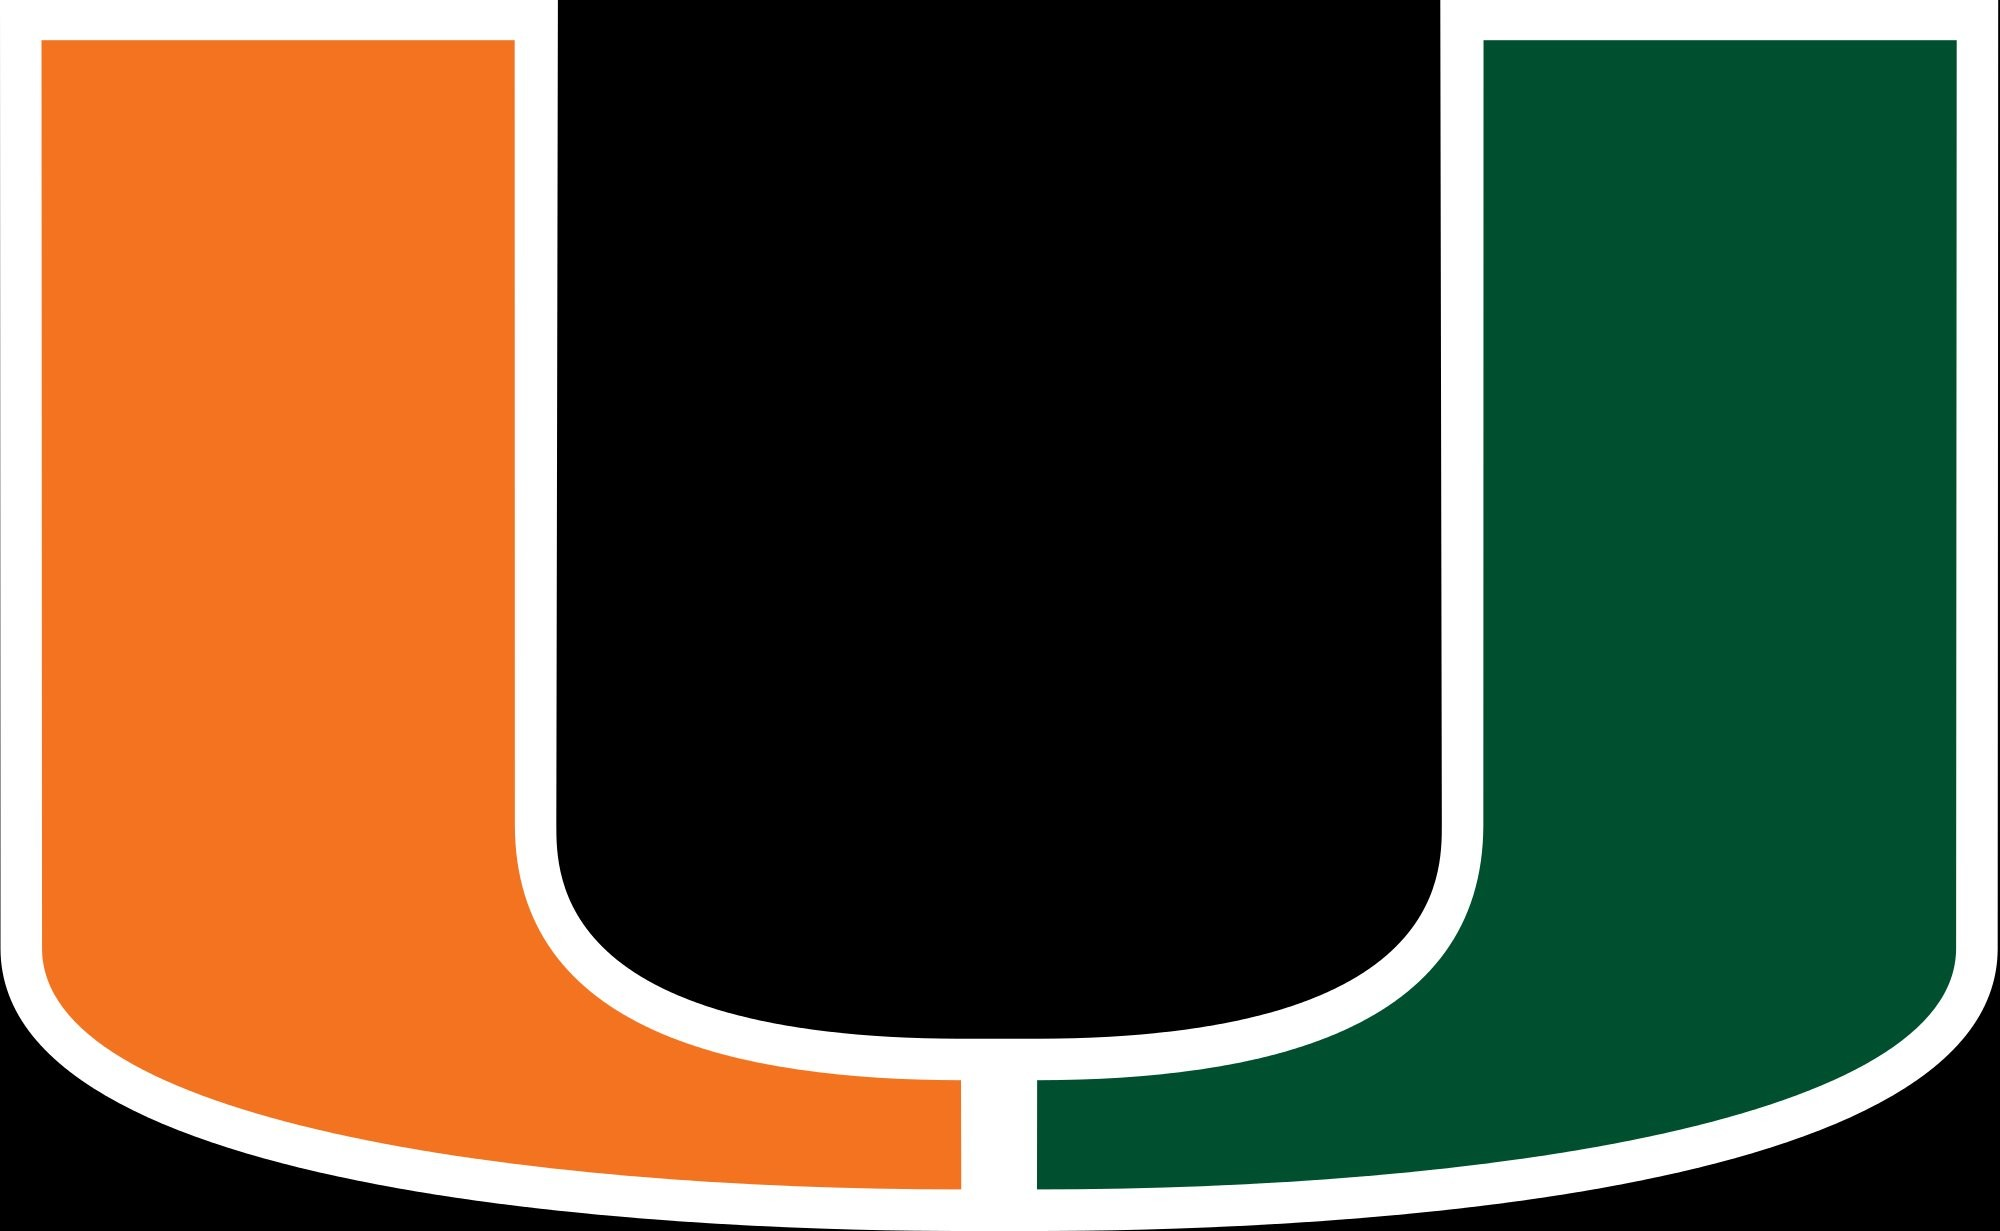 University Of Miami Wallpaper 183 ①